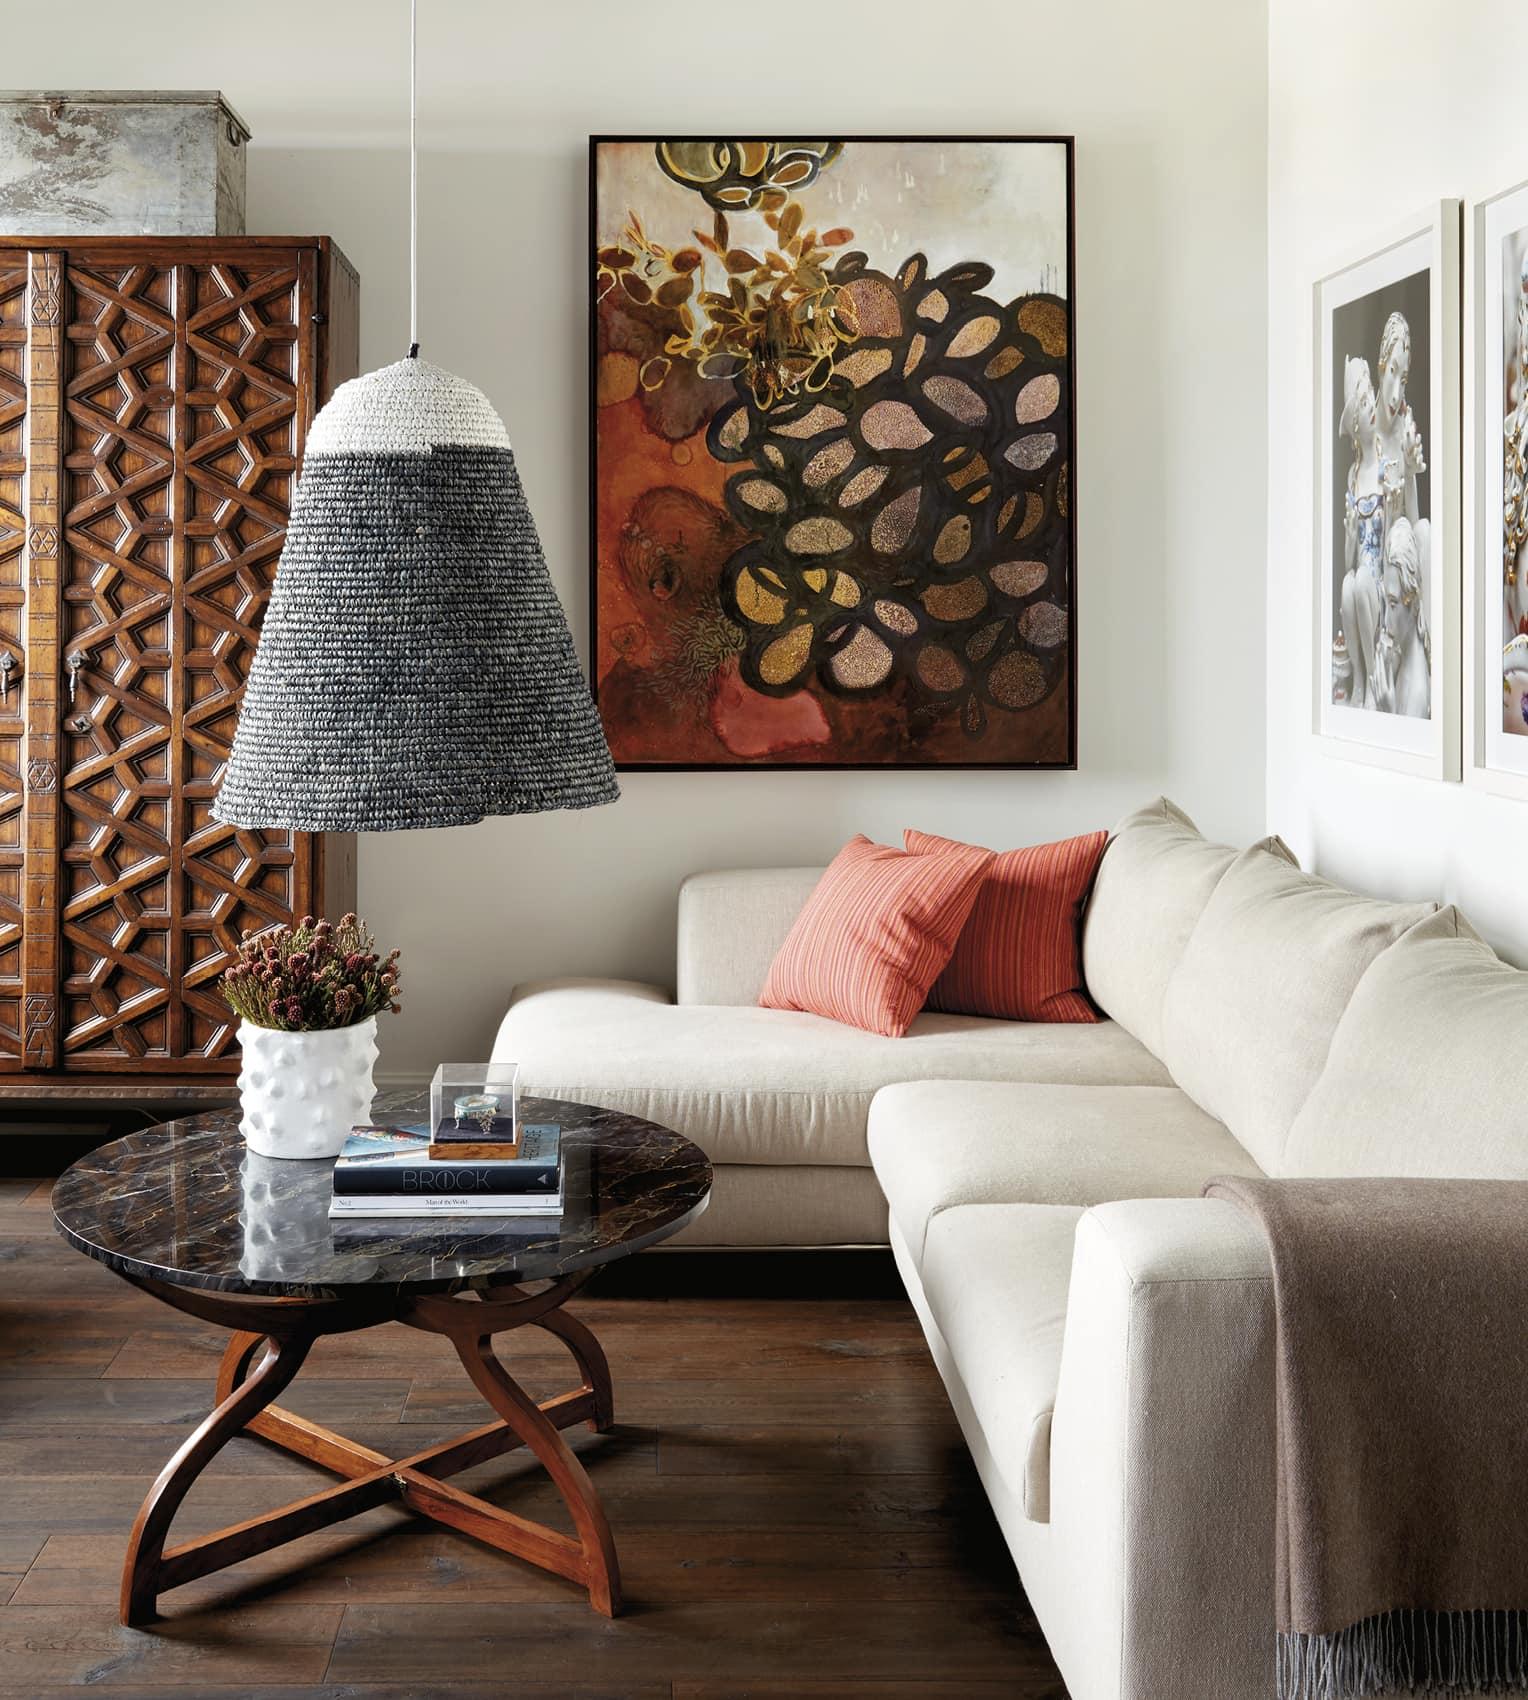 Comfortable sofa and interesting decor